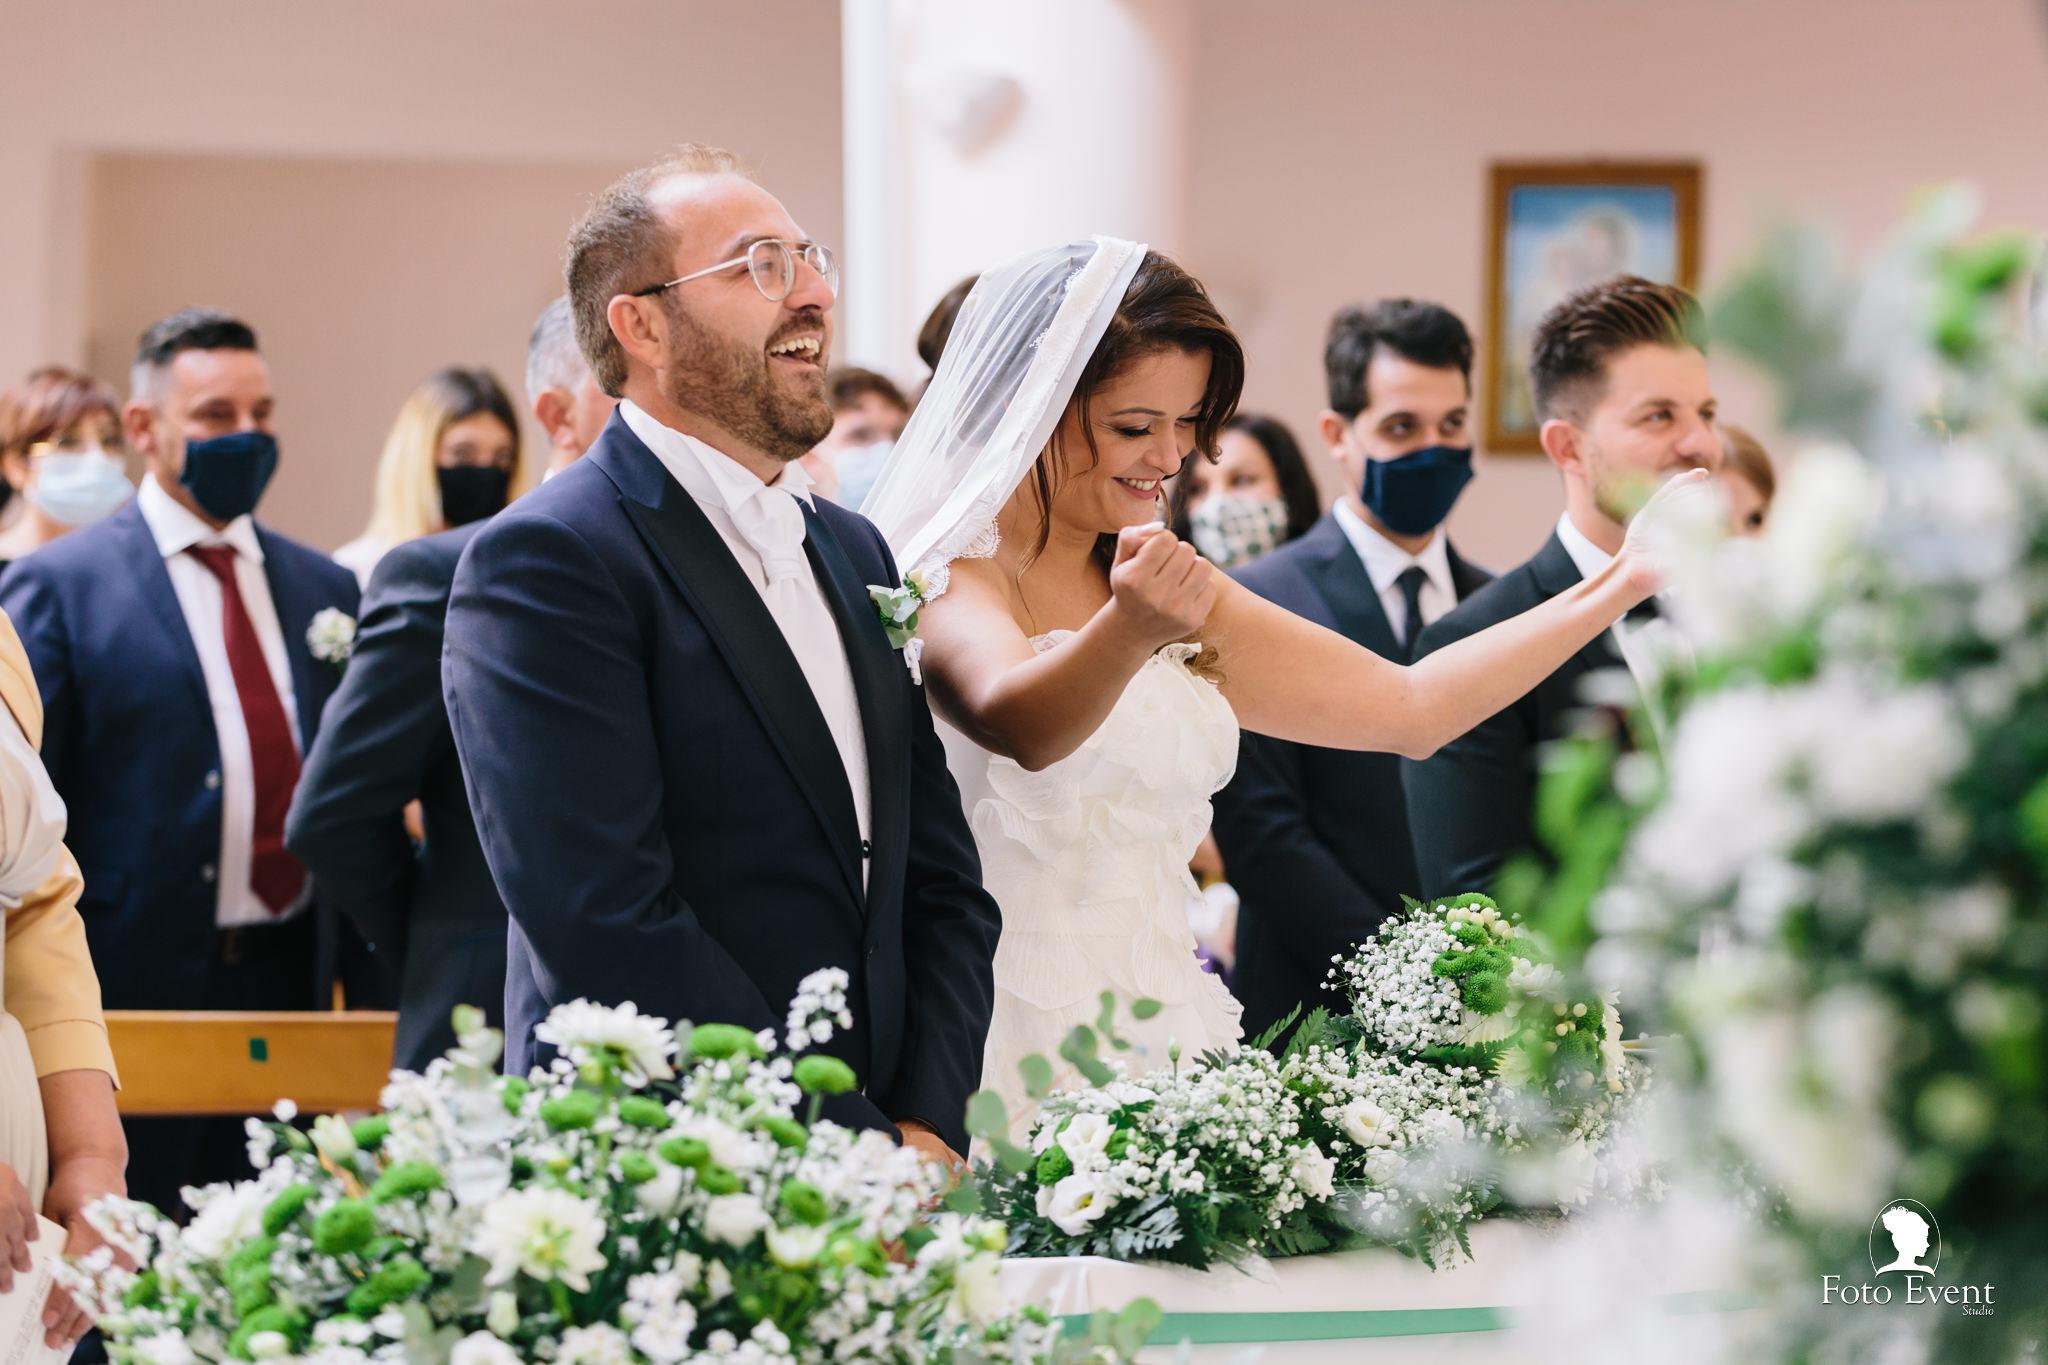 038-2020-10-15-Matrimonio-Noemi-e-Salvatore-Paterno-zoom-428